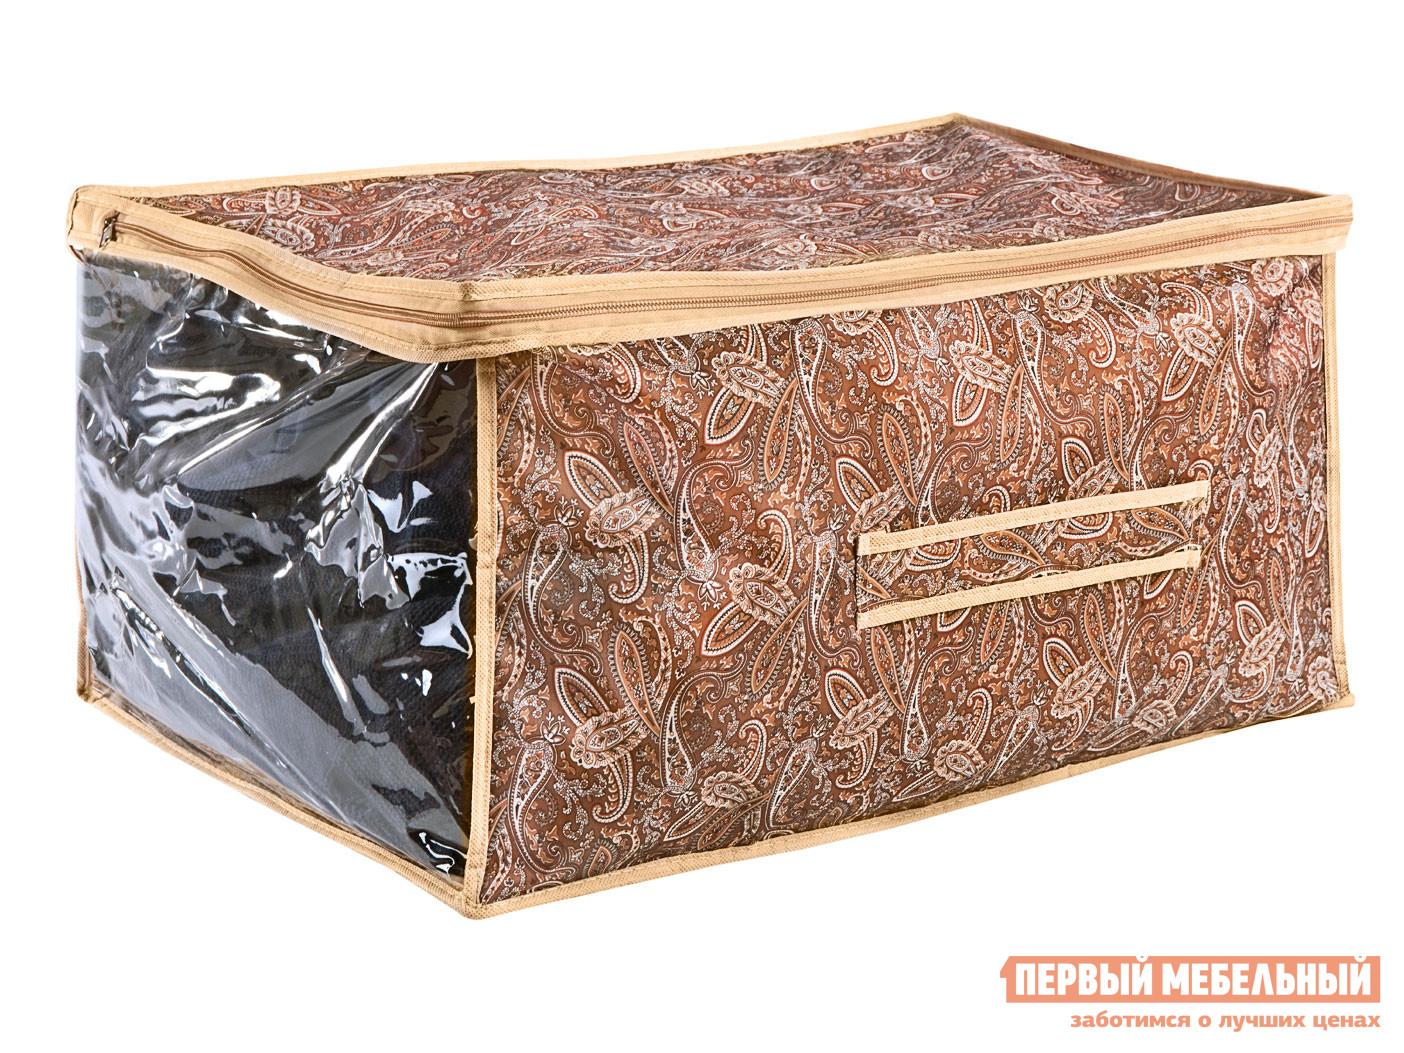 Кофр Первый Мебельный Кофр большой 60х50х30см кофр первый мебельный кофр малый 30х30х20см